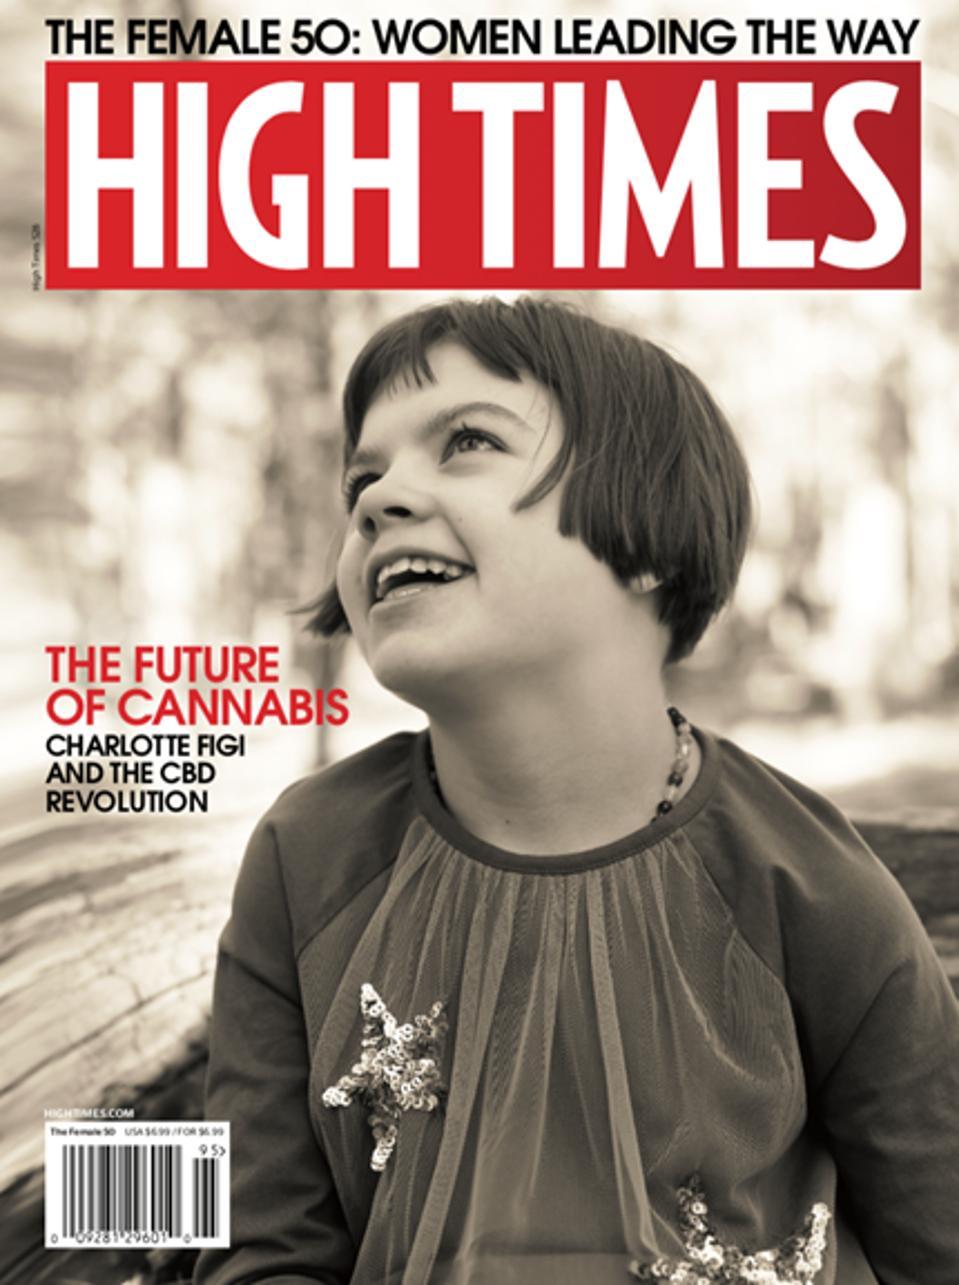 Charlotte Figi, High Times, CBD movement, Charlotte's Web, medical marijuana